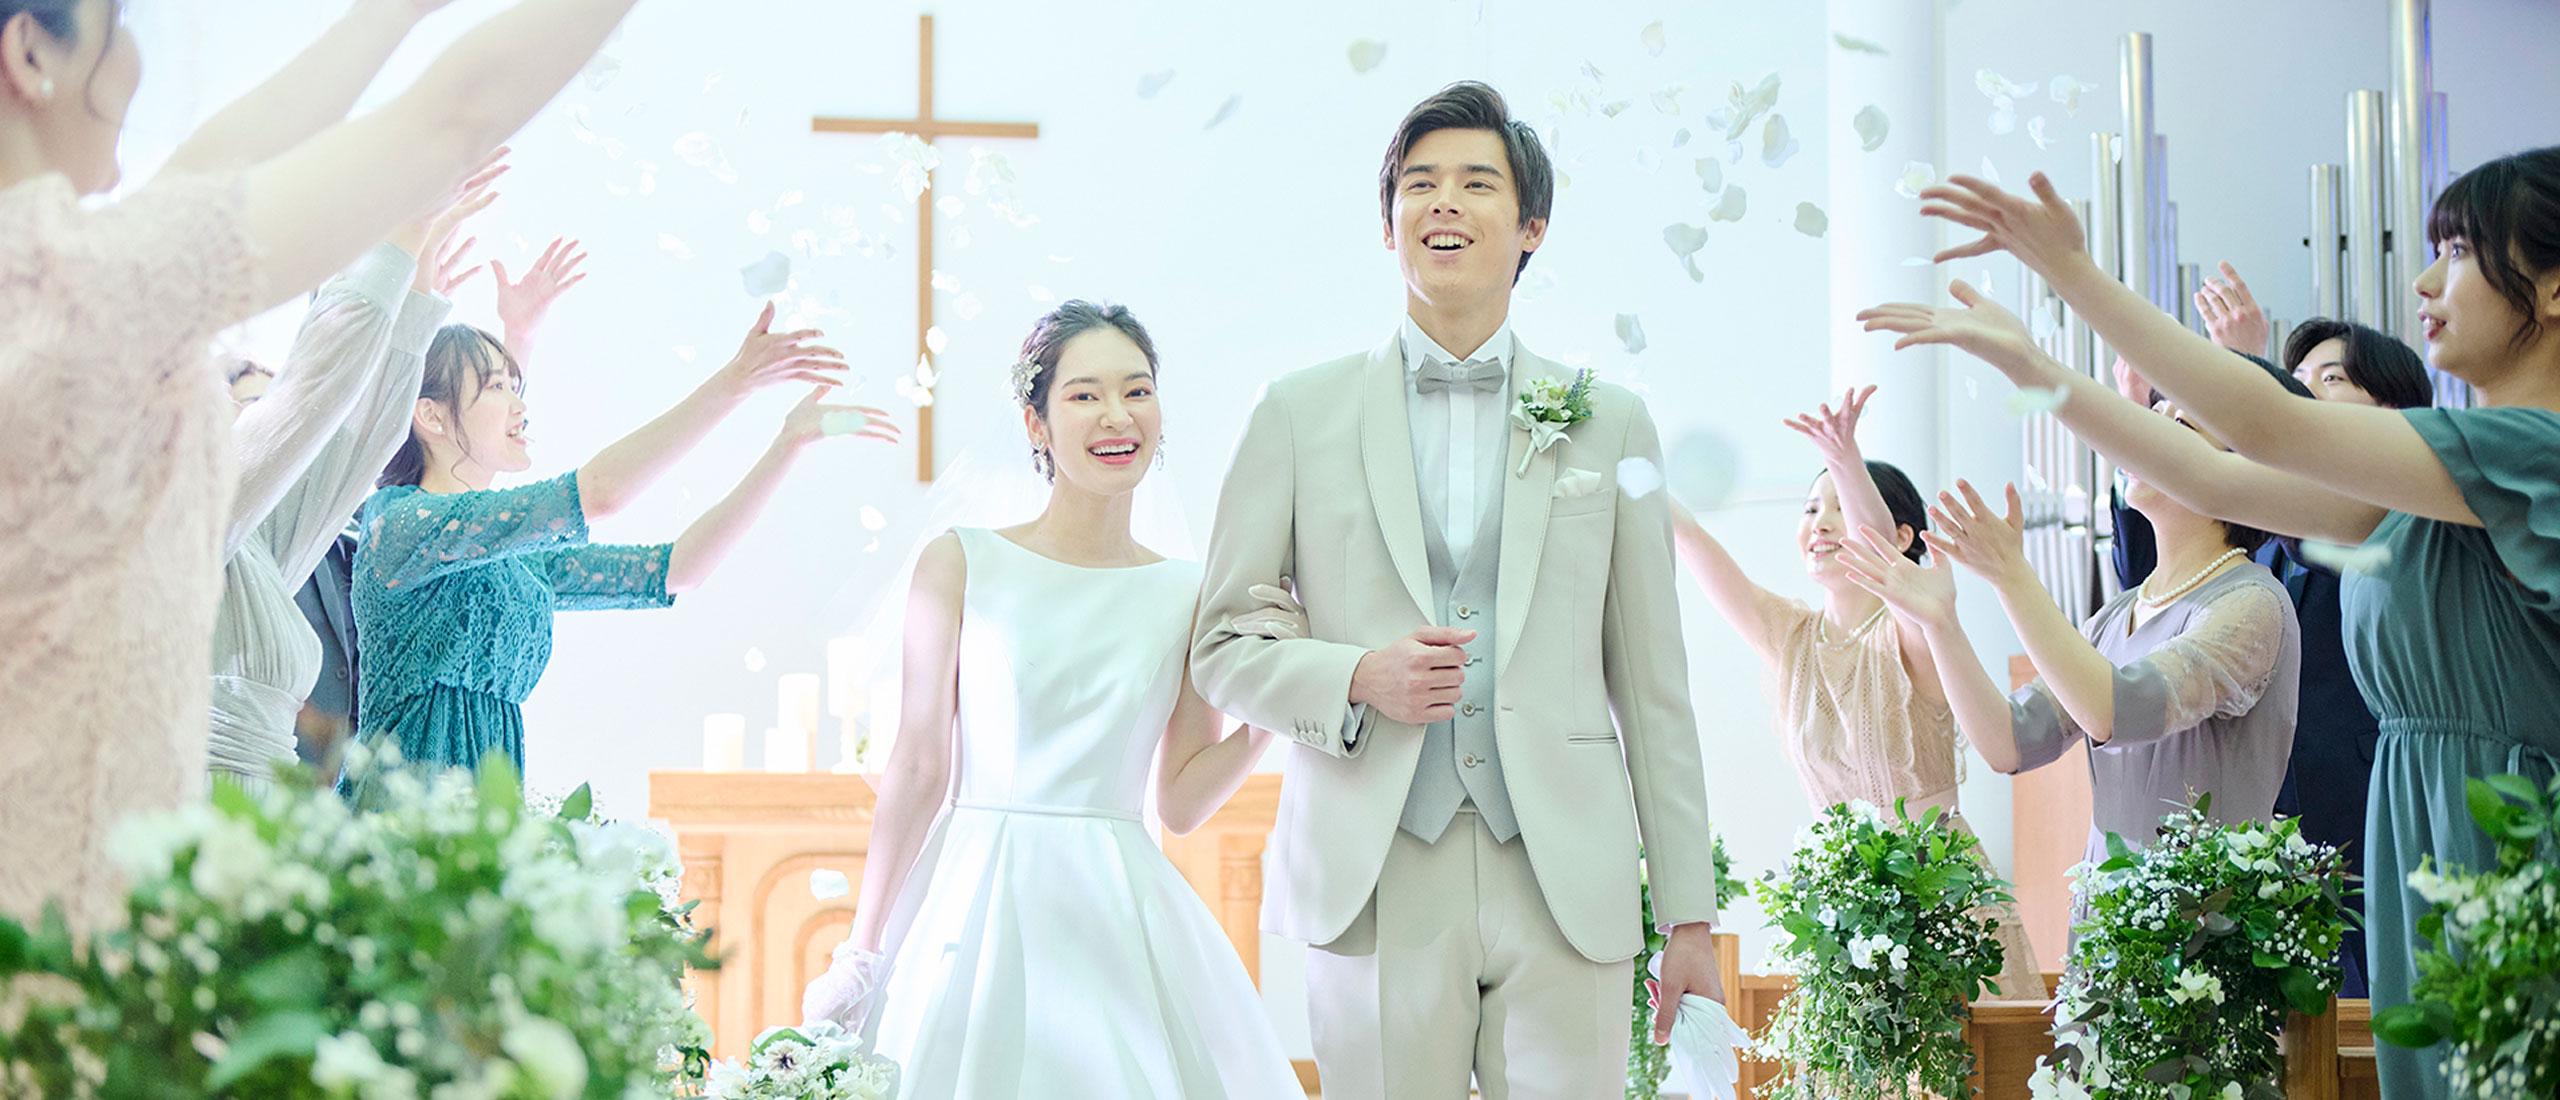 Shin-Yokohama Grace hotel wedding